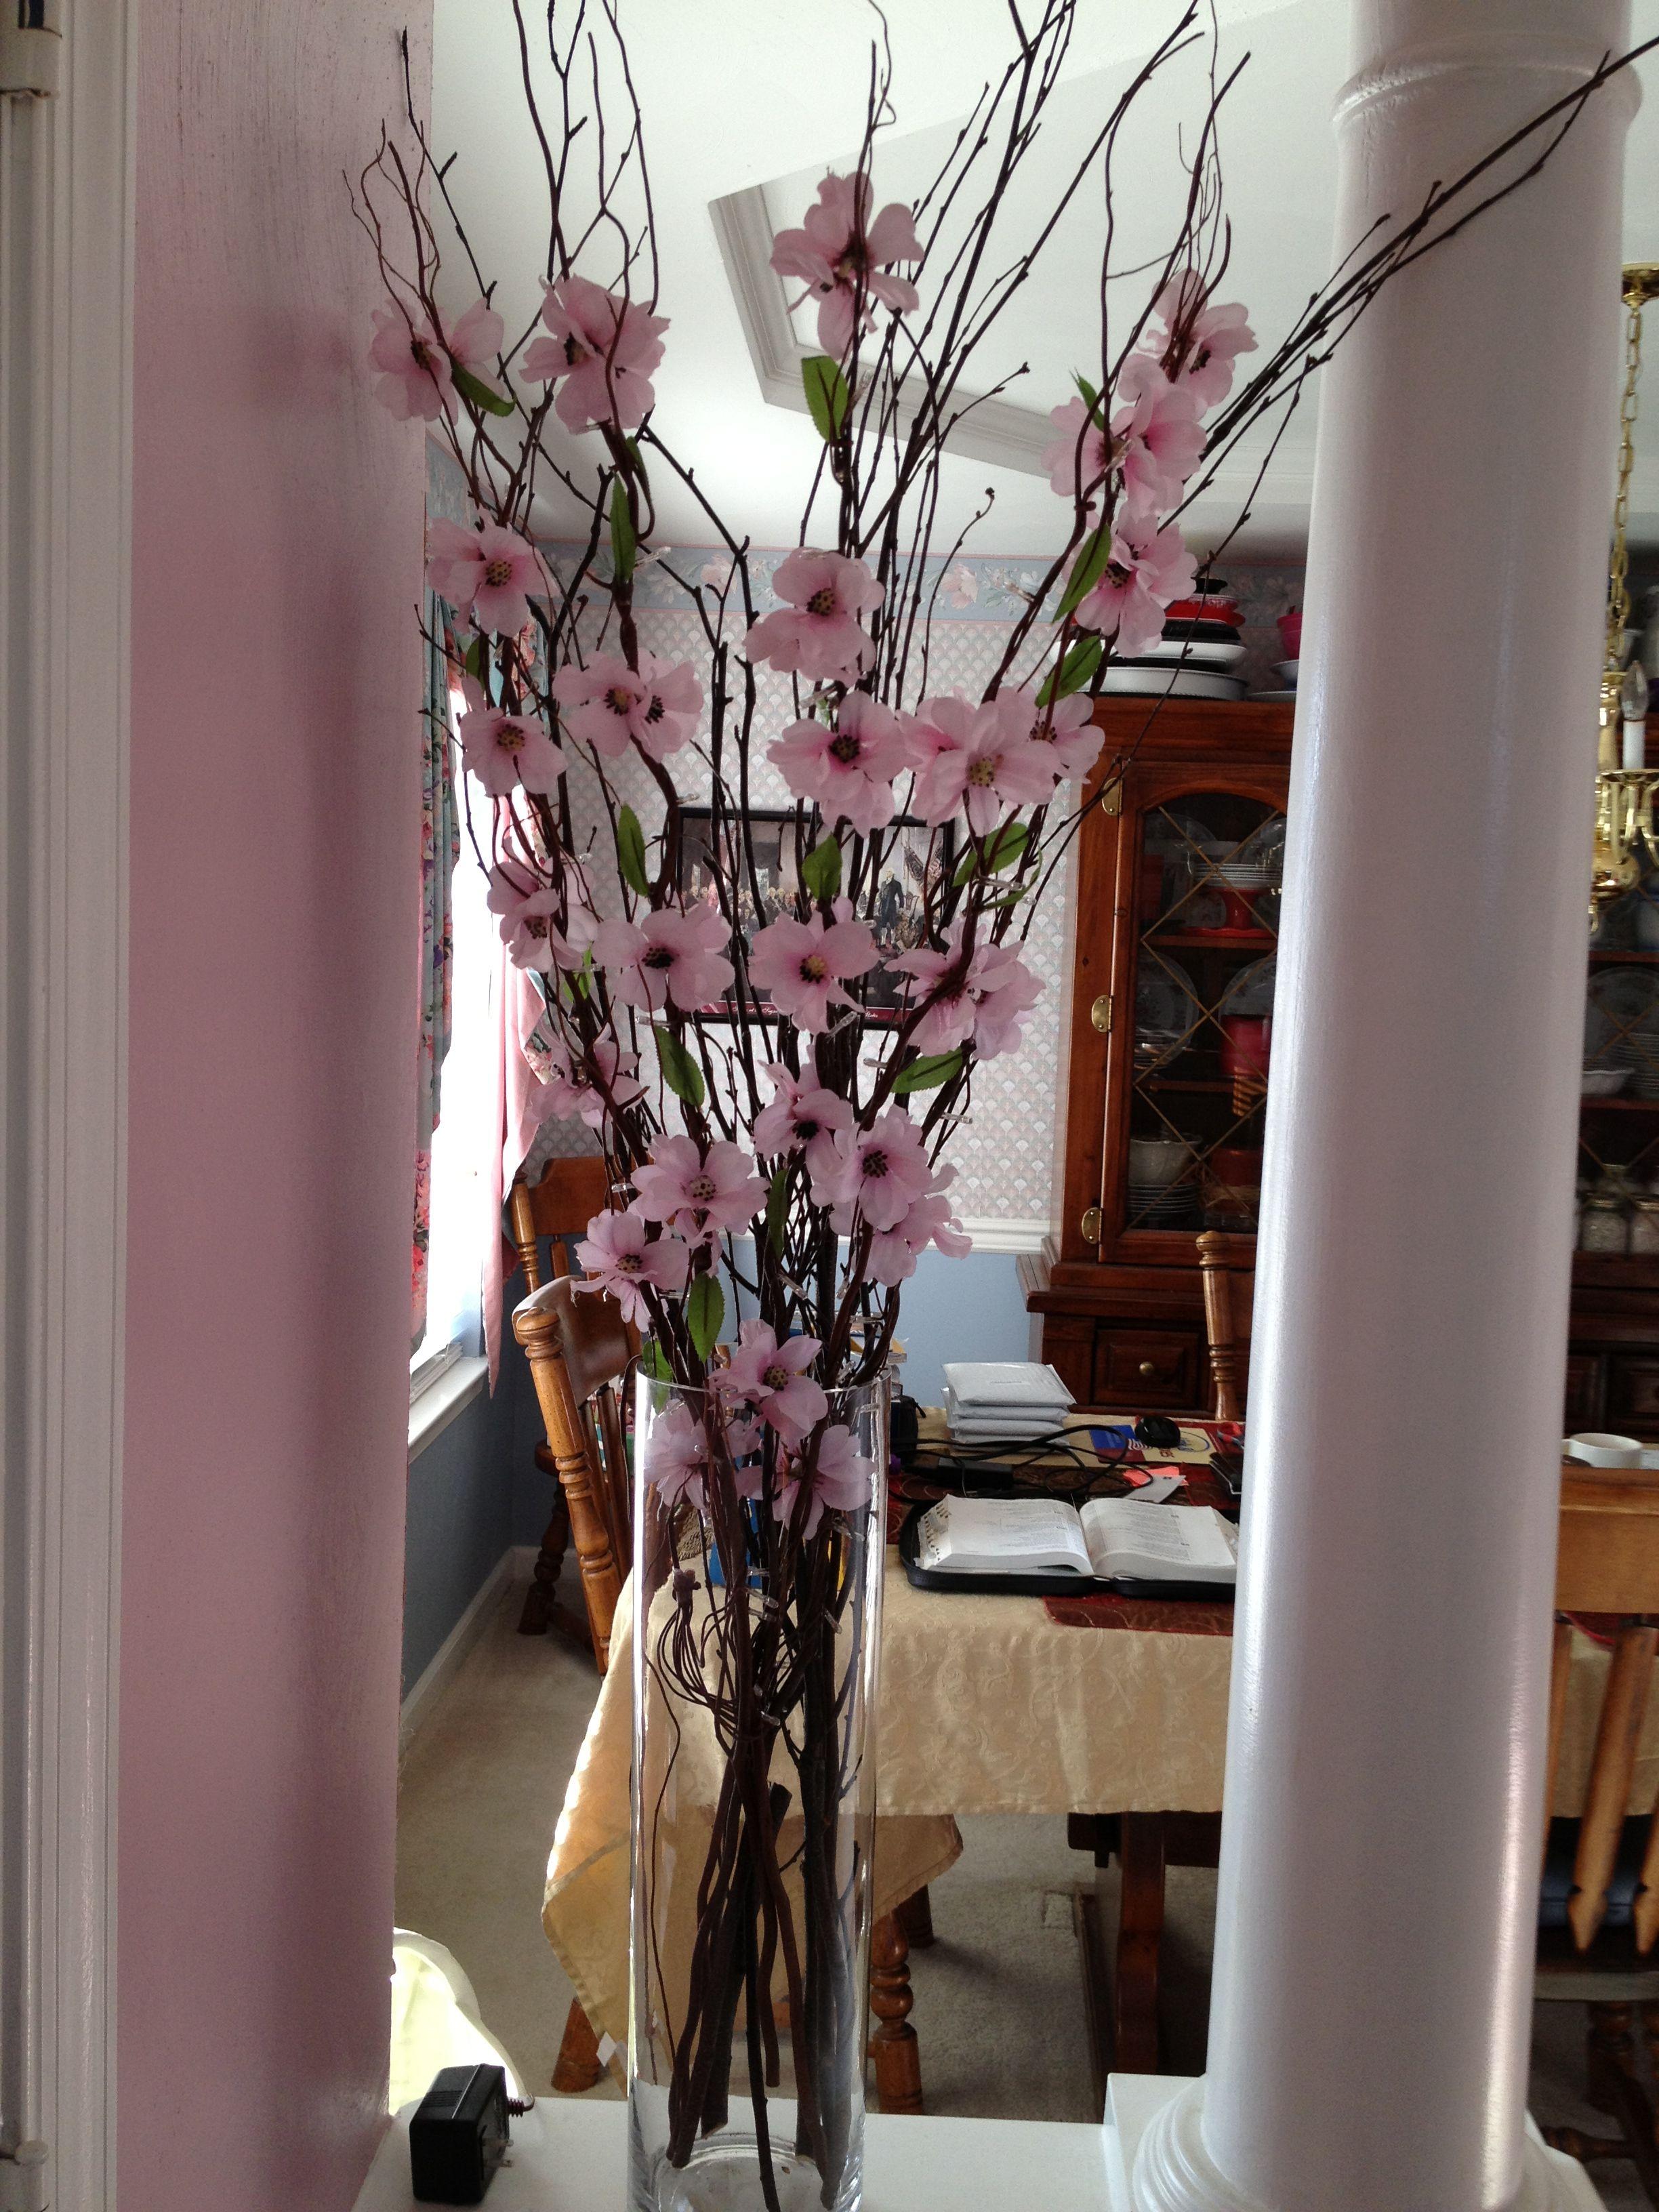 Dyi Cherry Blossom Centerpiece Total Cost 35 00 Vase Tjmaxx 12 00 Light Up Branches Ross Cherry Blossom Centerpiece Cool Diy Projects Cherry Blossom Branch